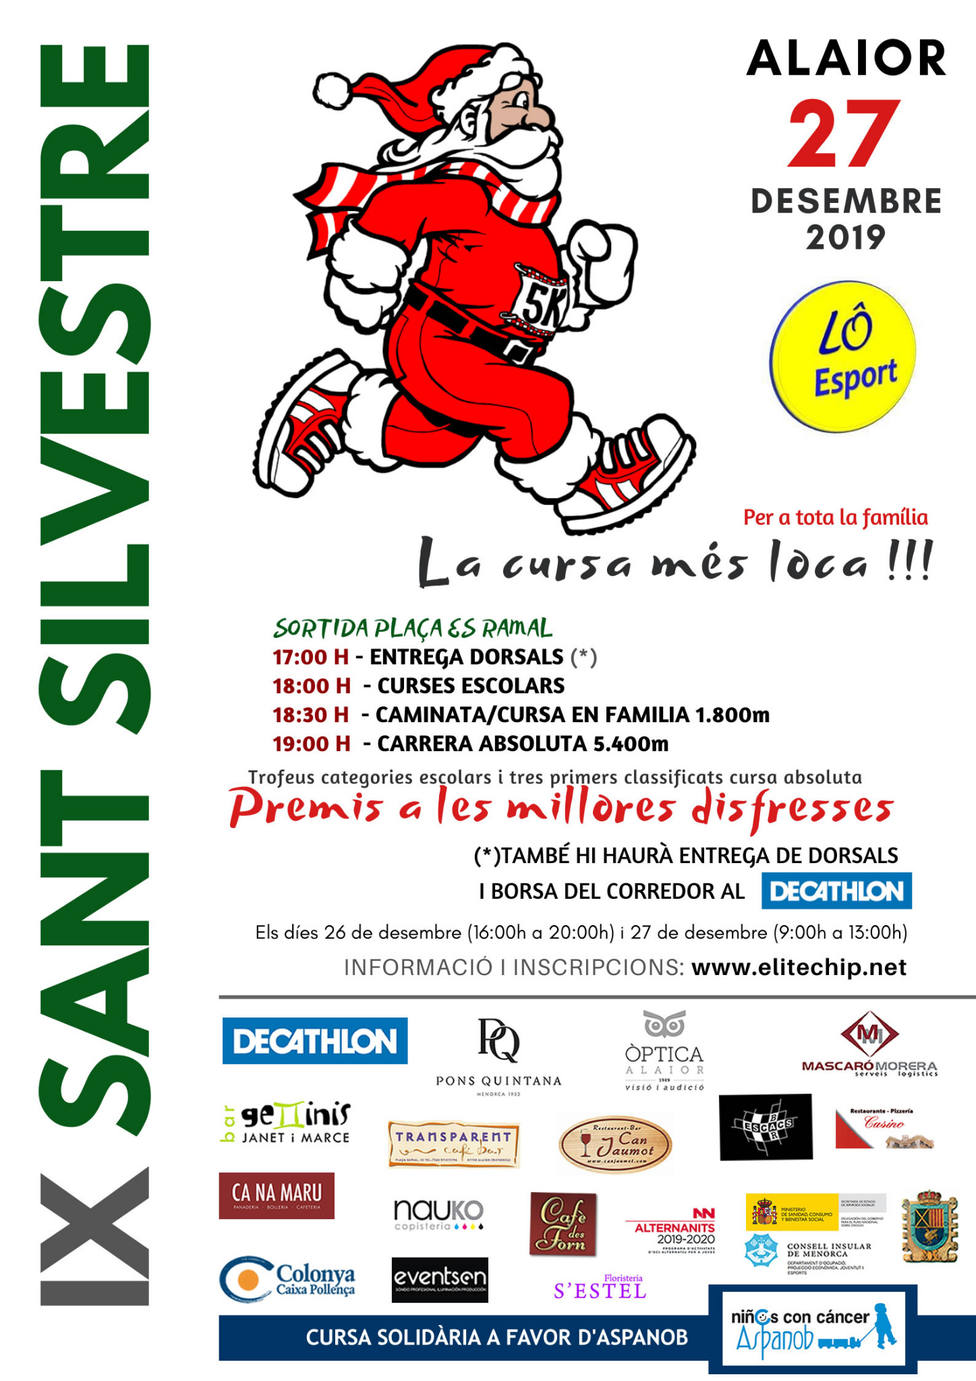 IX San Silvestre de Alaior 2019